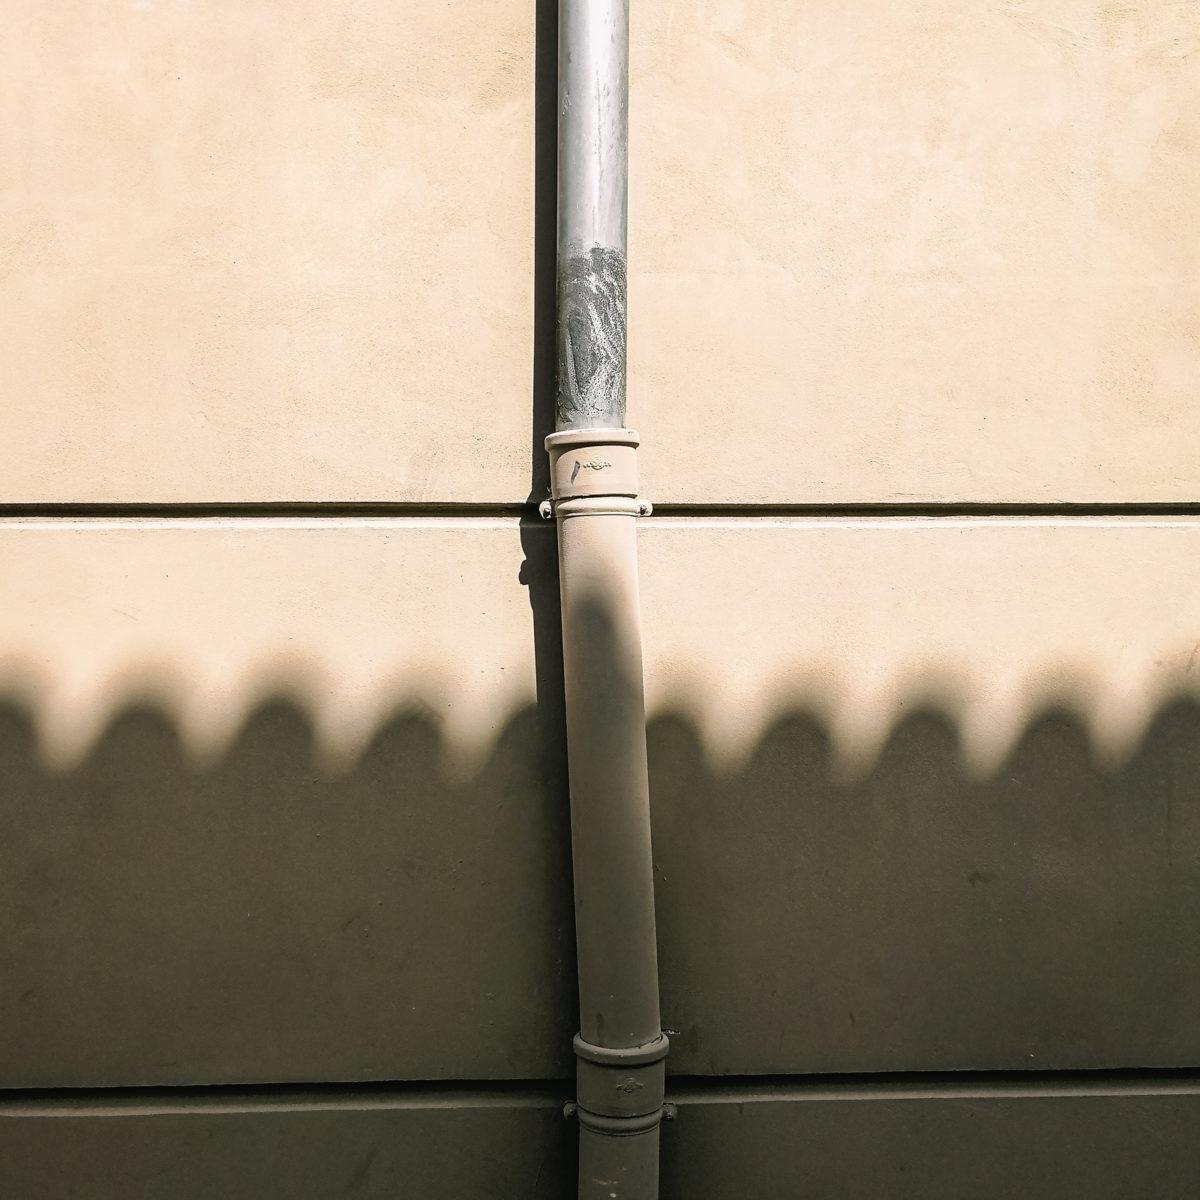 aliocha boi arles photographie projections ombre lumiere4 - Le photographe Aliocha Boi révèle la façade street d'Arles